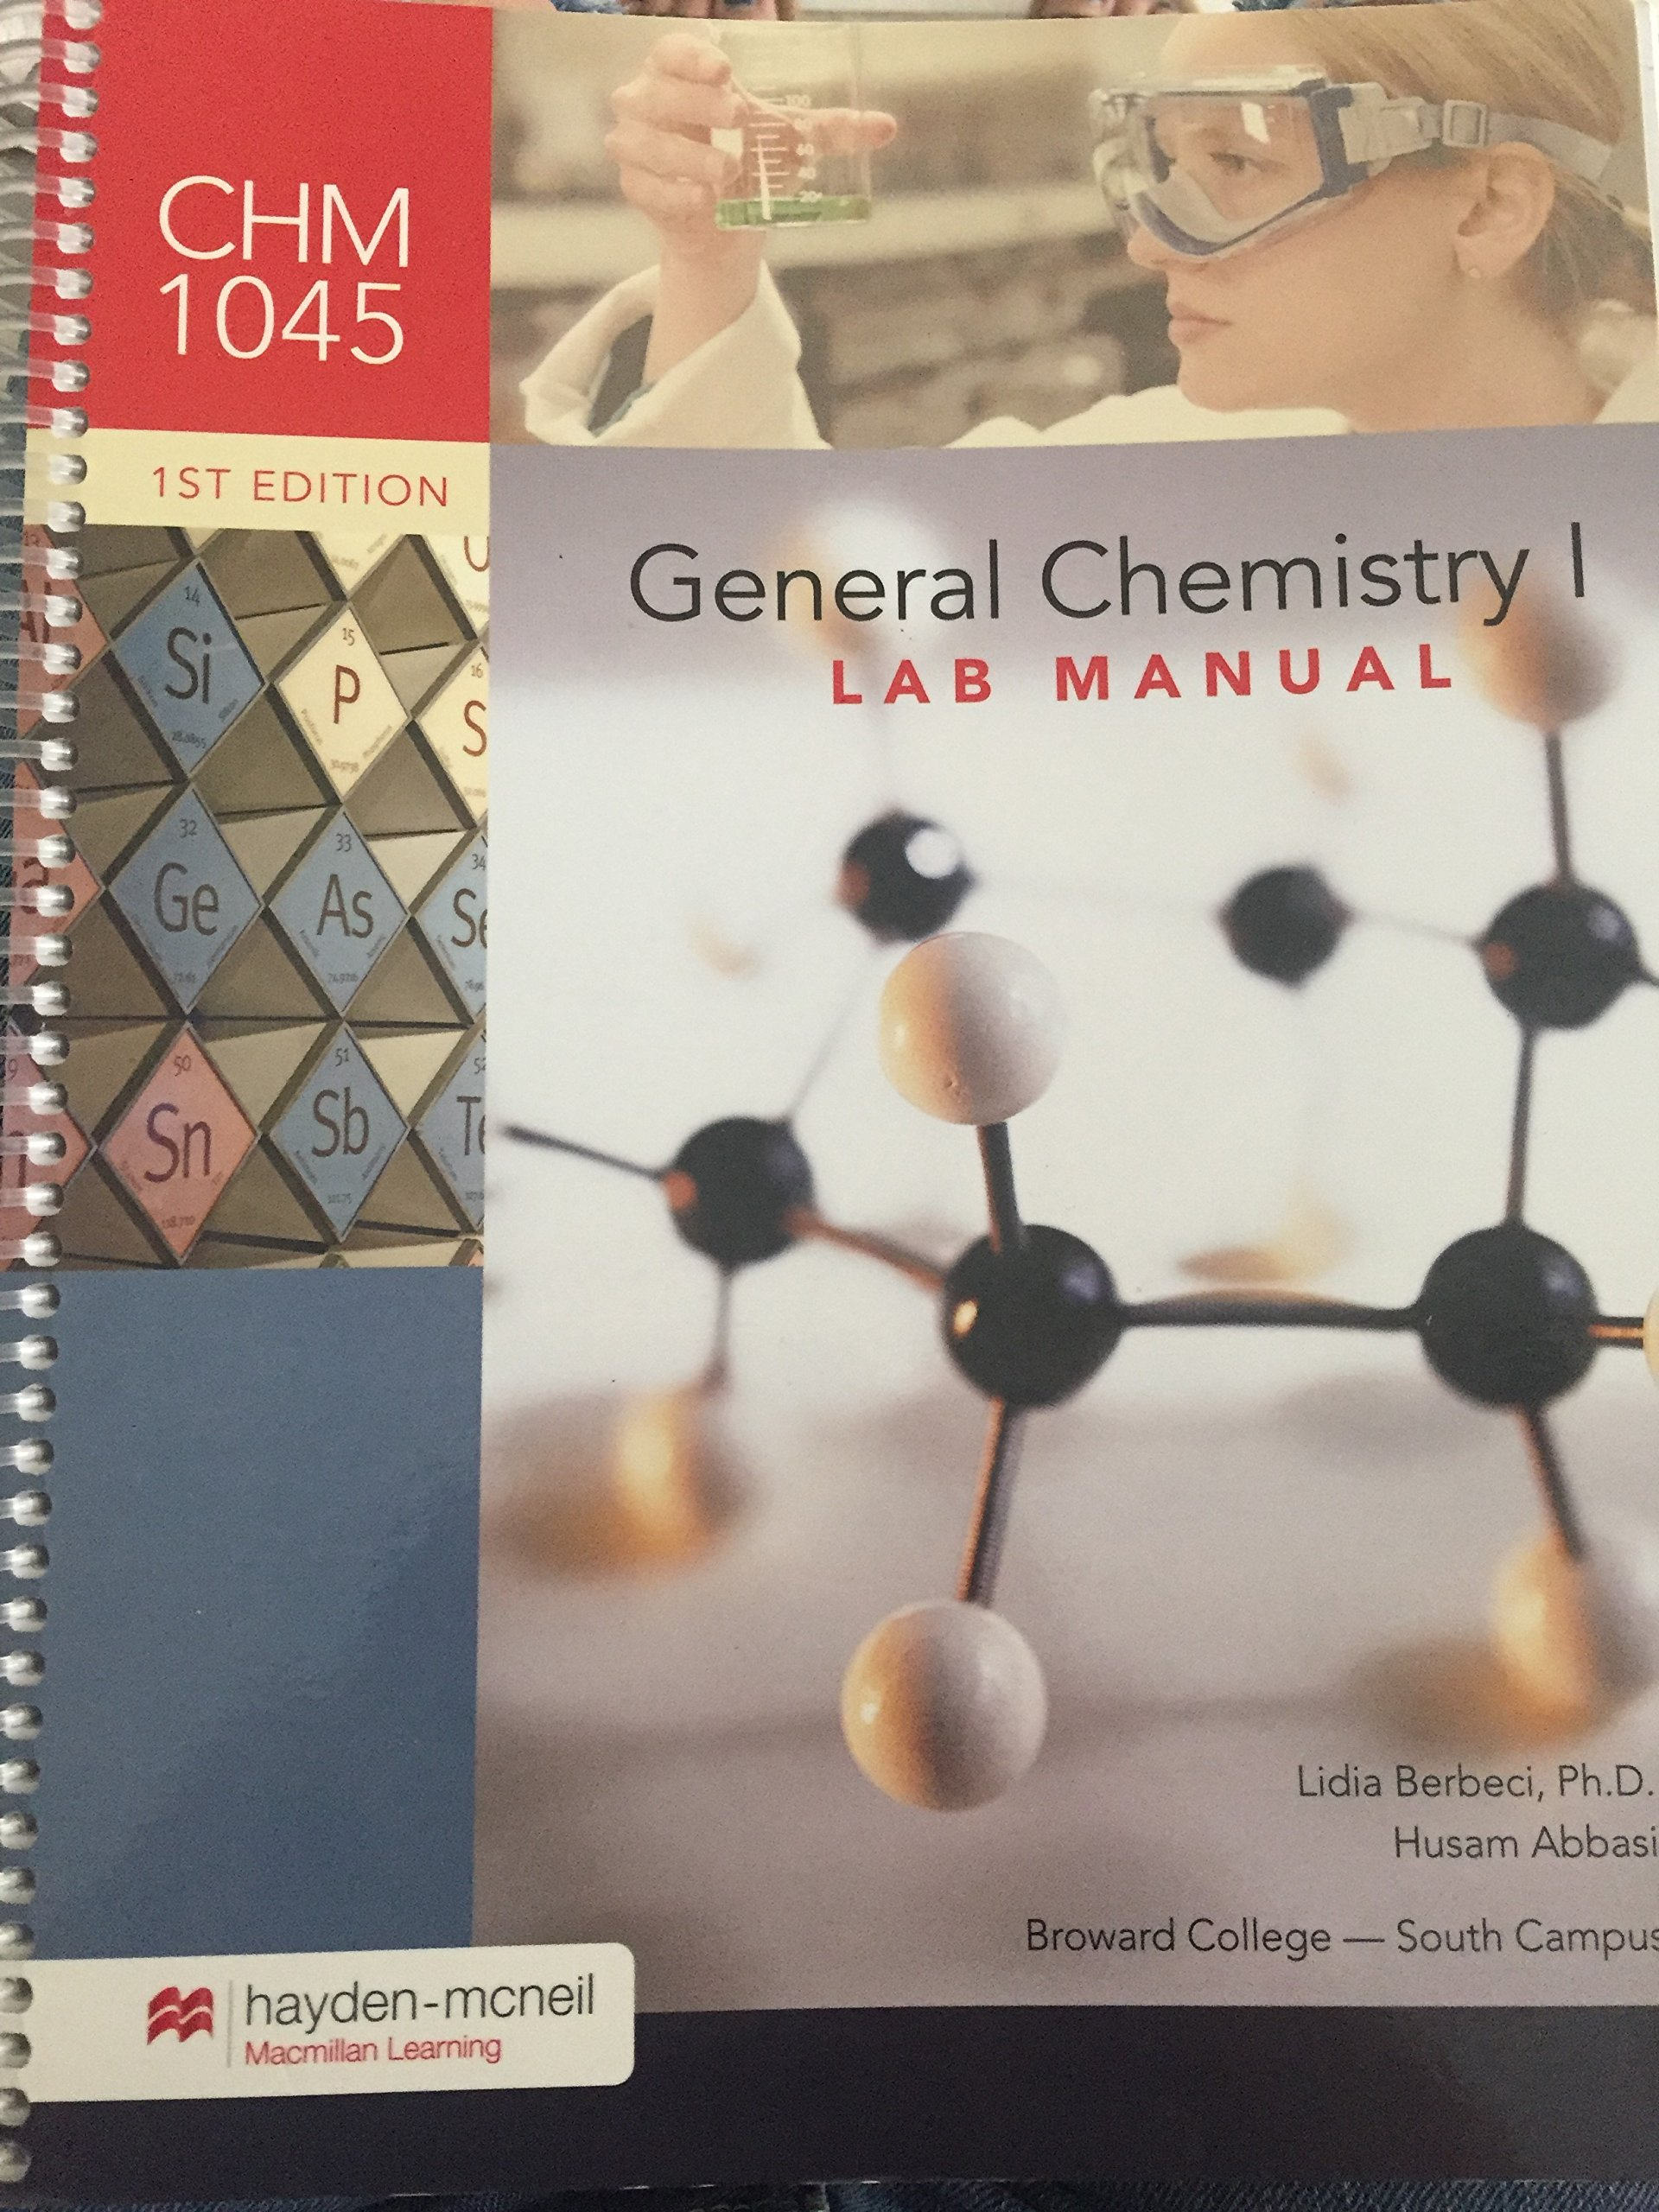 General Chemistry I Lab Manual 1st Edition CHM1045 Broward College: Ph. D.  Lidia Berbeci, Husam Abbasi, LLC Hayden-Mcneil: 9780738089256: Amazon.com:  Books